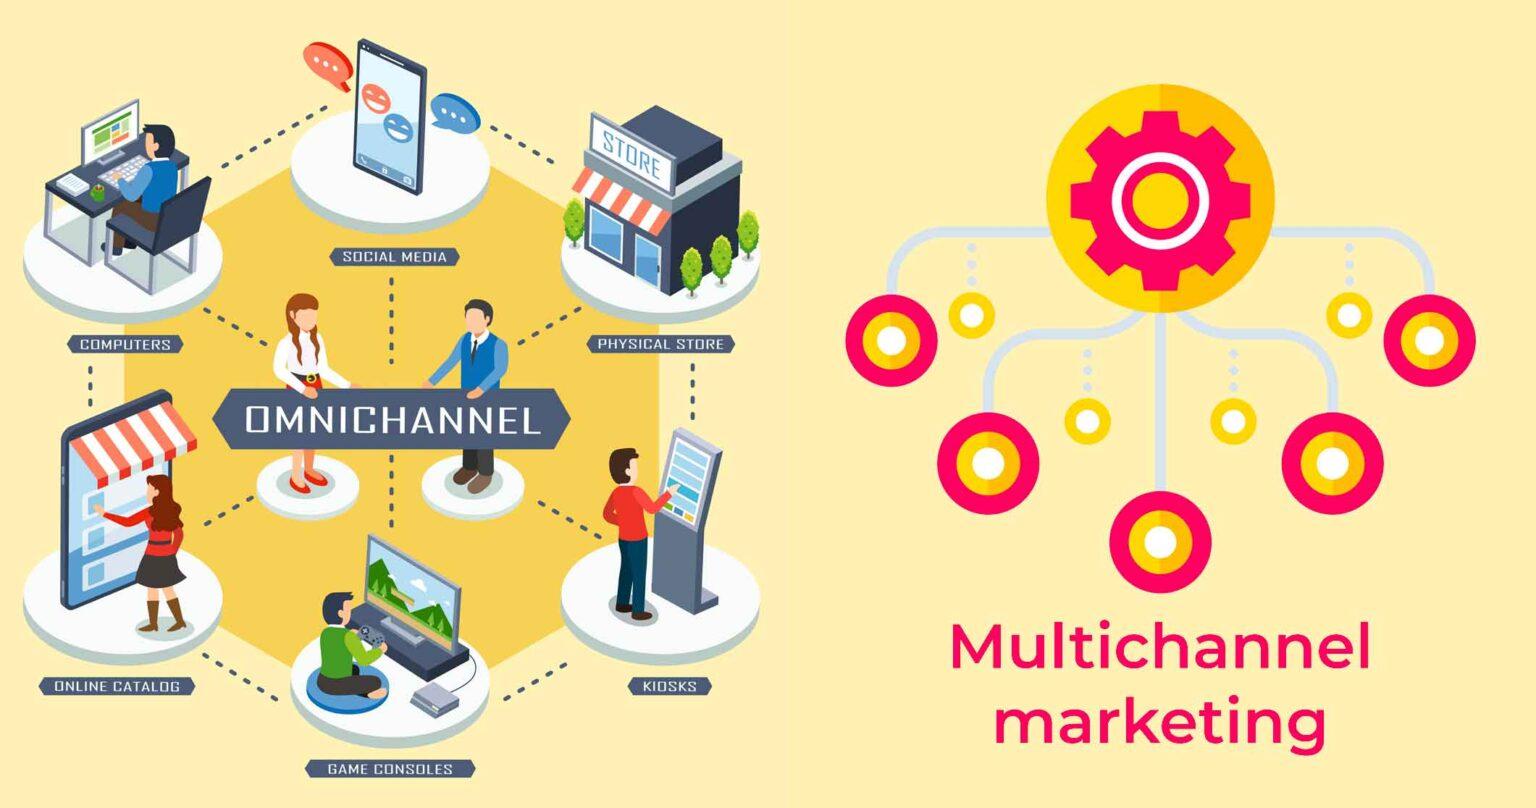 Omnichannel marketing and multichannel marketing